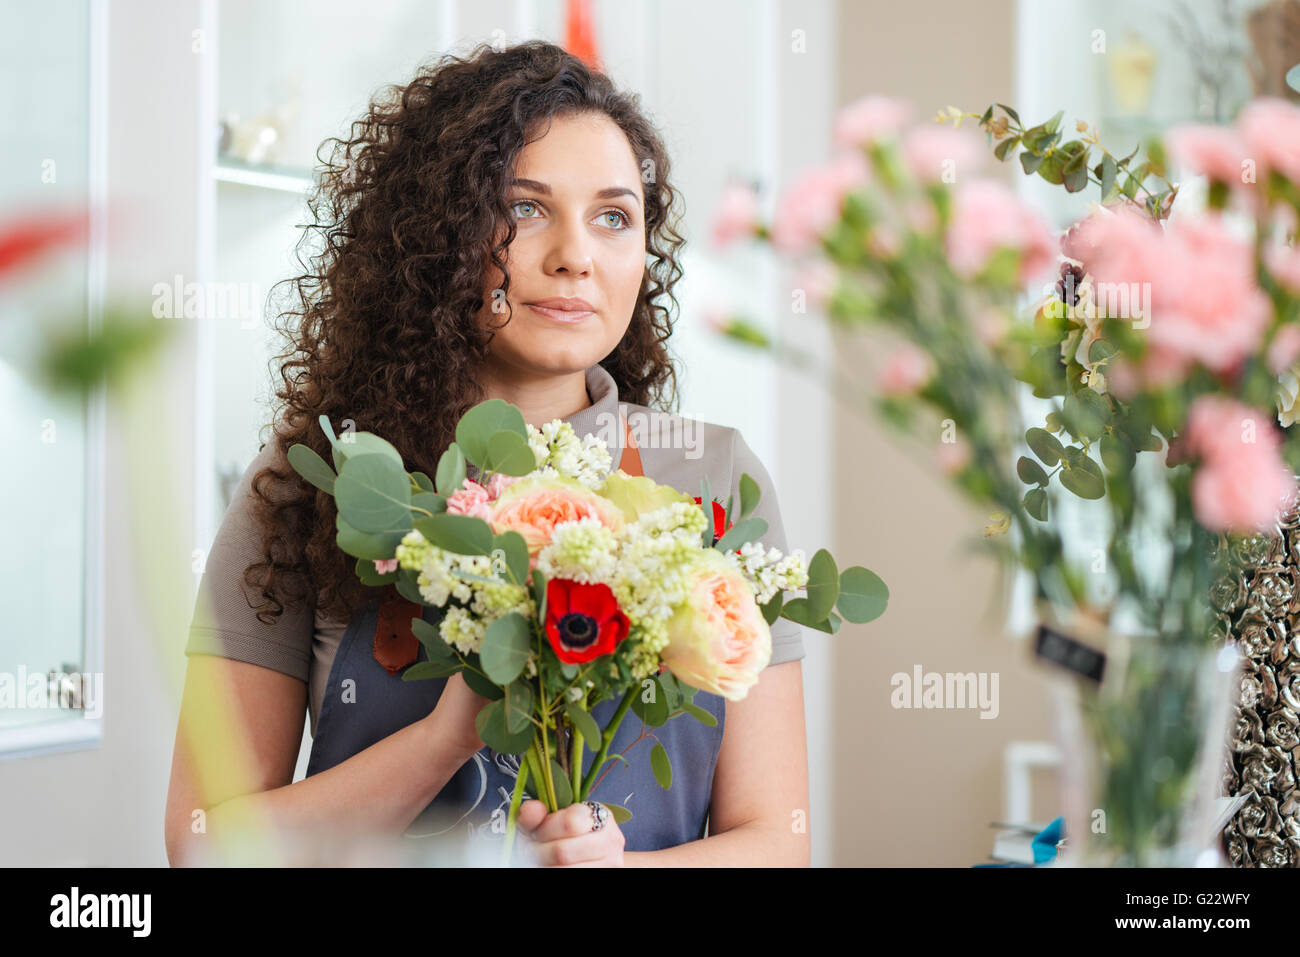 Porträt der schönen jungen Frau Florist im Blumenladen Stockbild